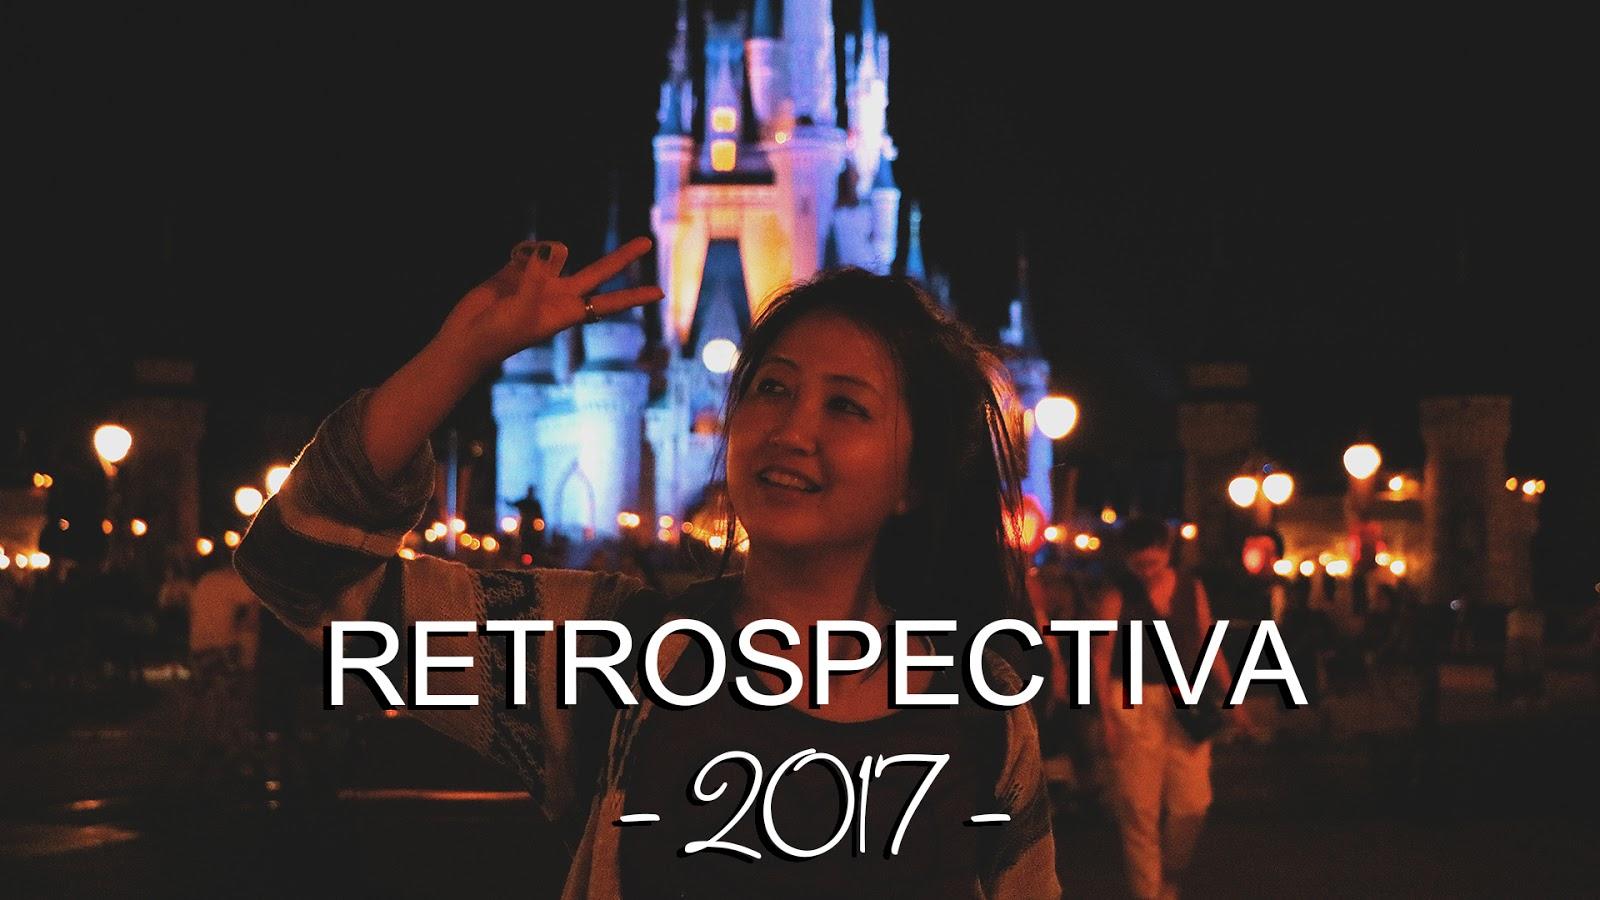 capa retrospectiva 2017